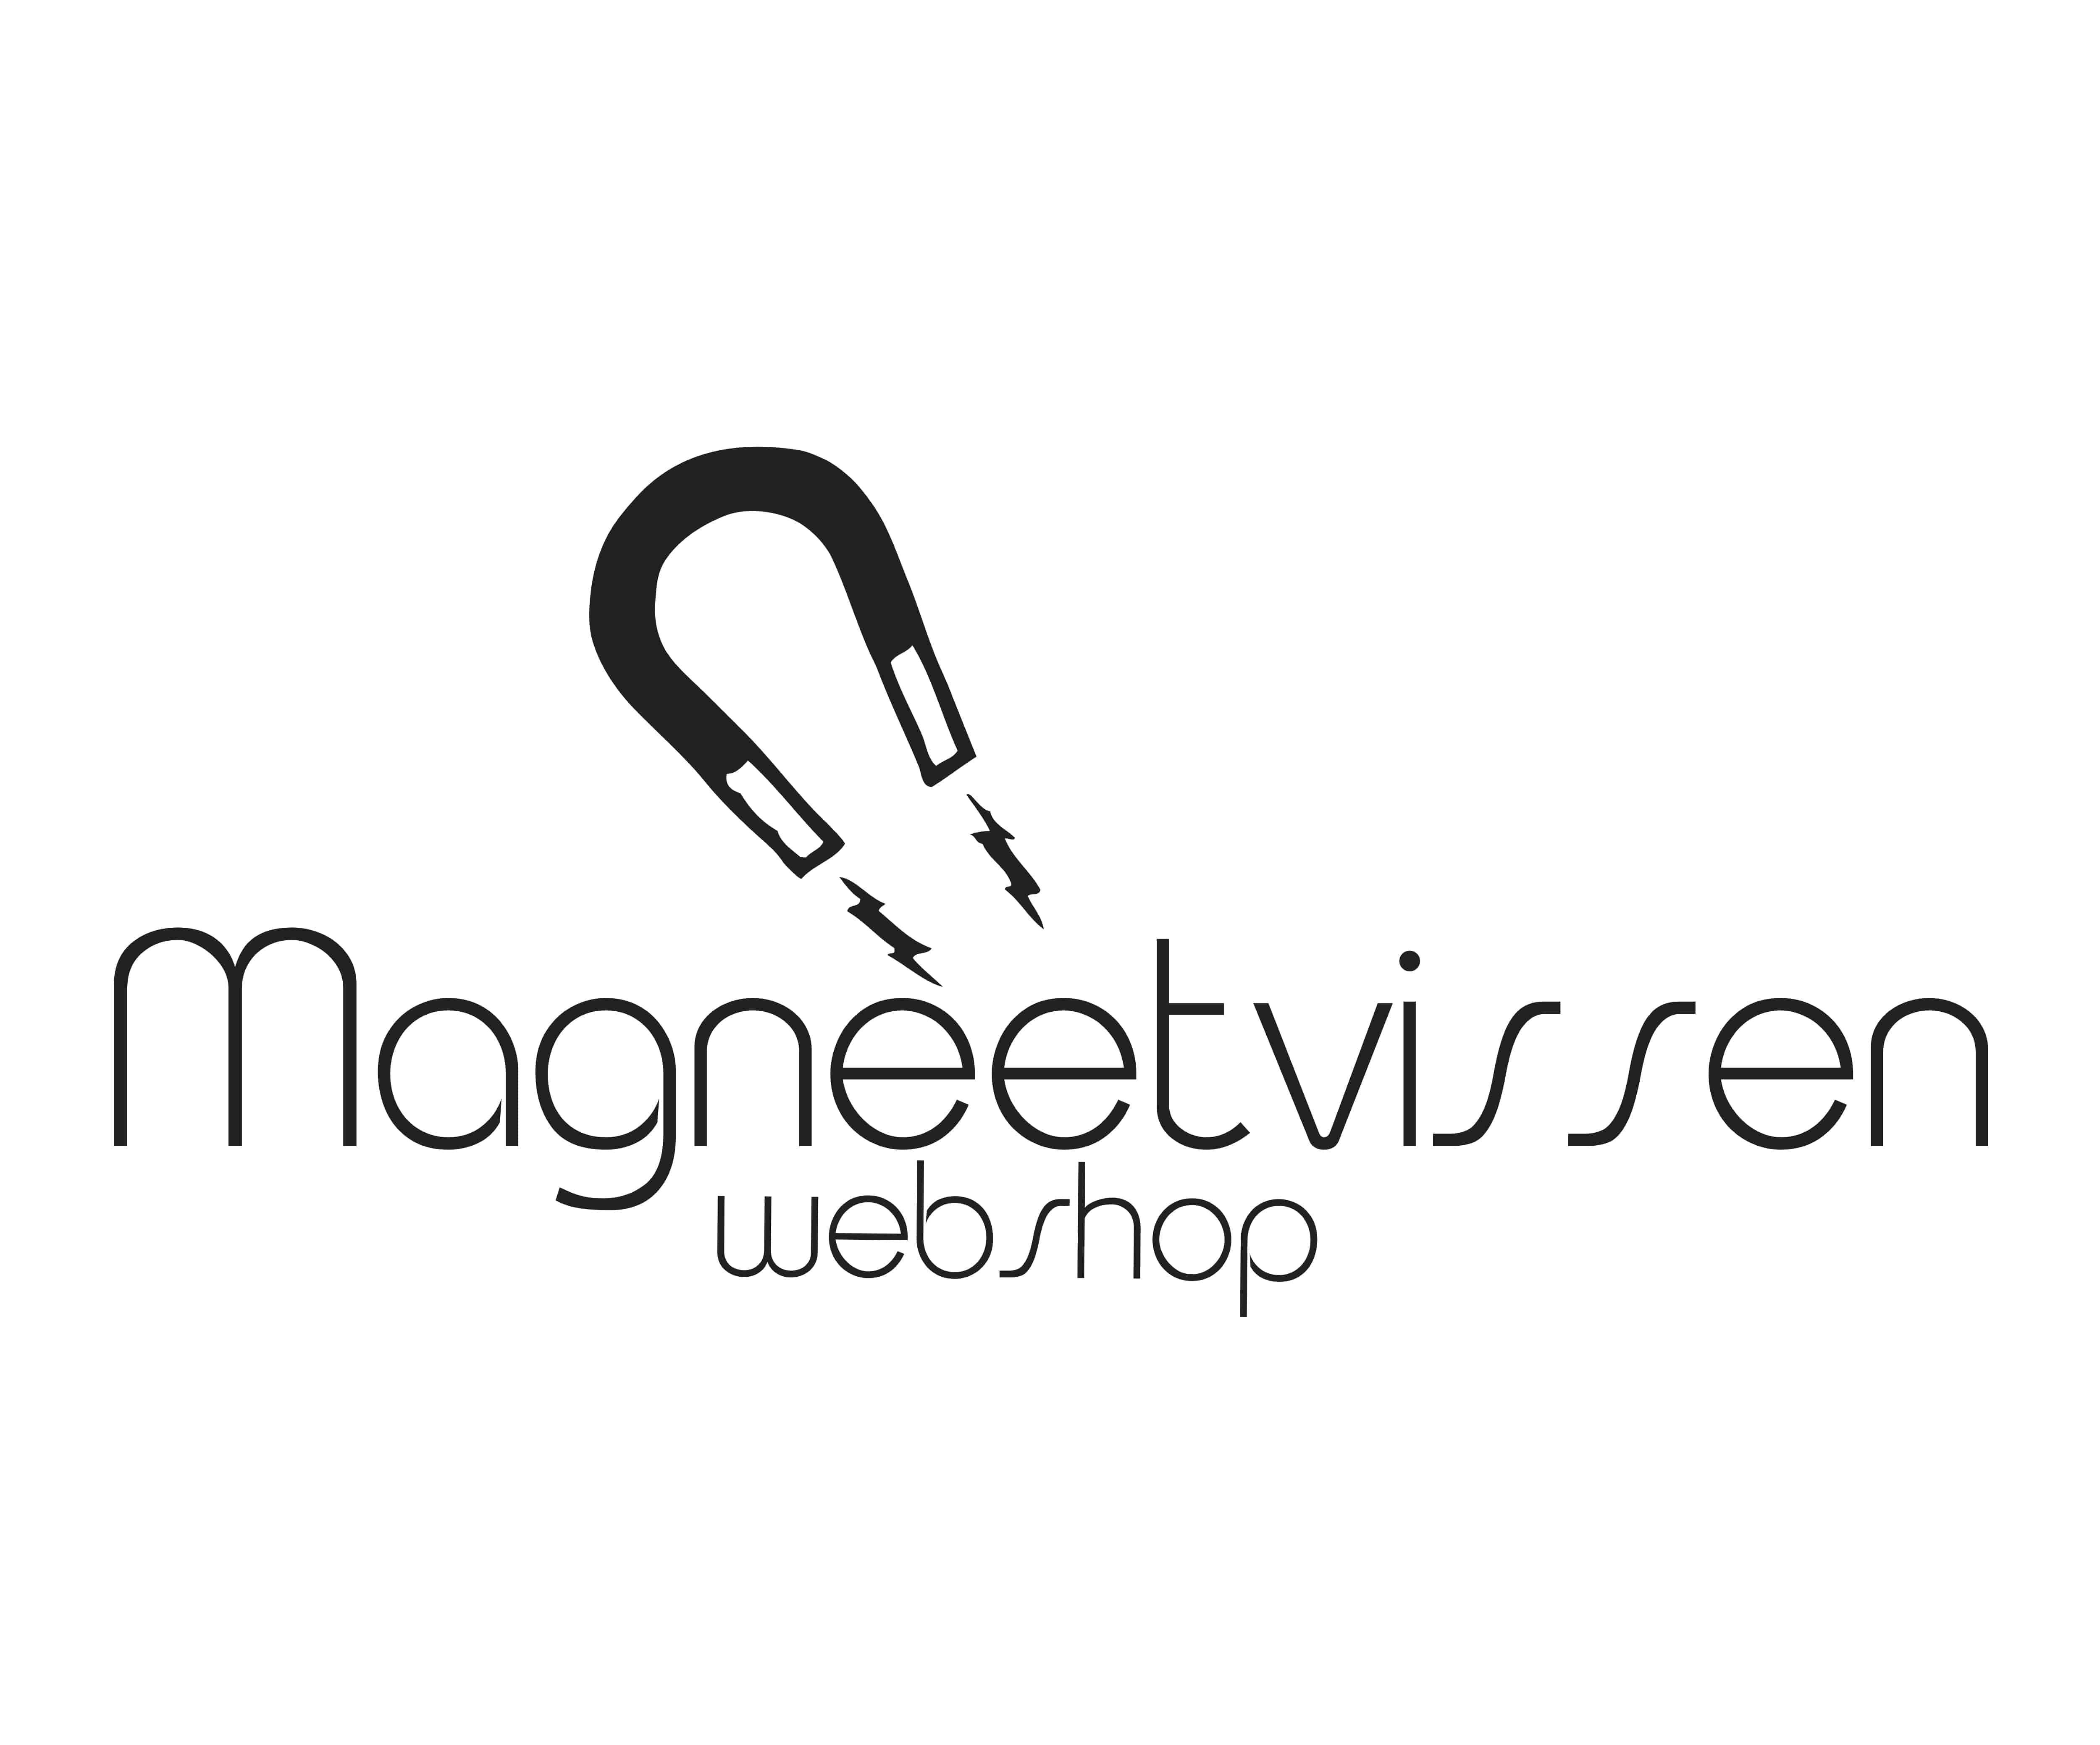 magneetvissers, magneetvissers, magneetvissers, magneetvissen, magneetvissen, magneetvissen, magneetvissen, magneetvissen, magneetvissen, vismagneet, vismagneet, vismagneet, vismagneet, vismagneet